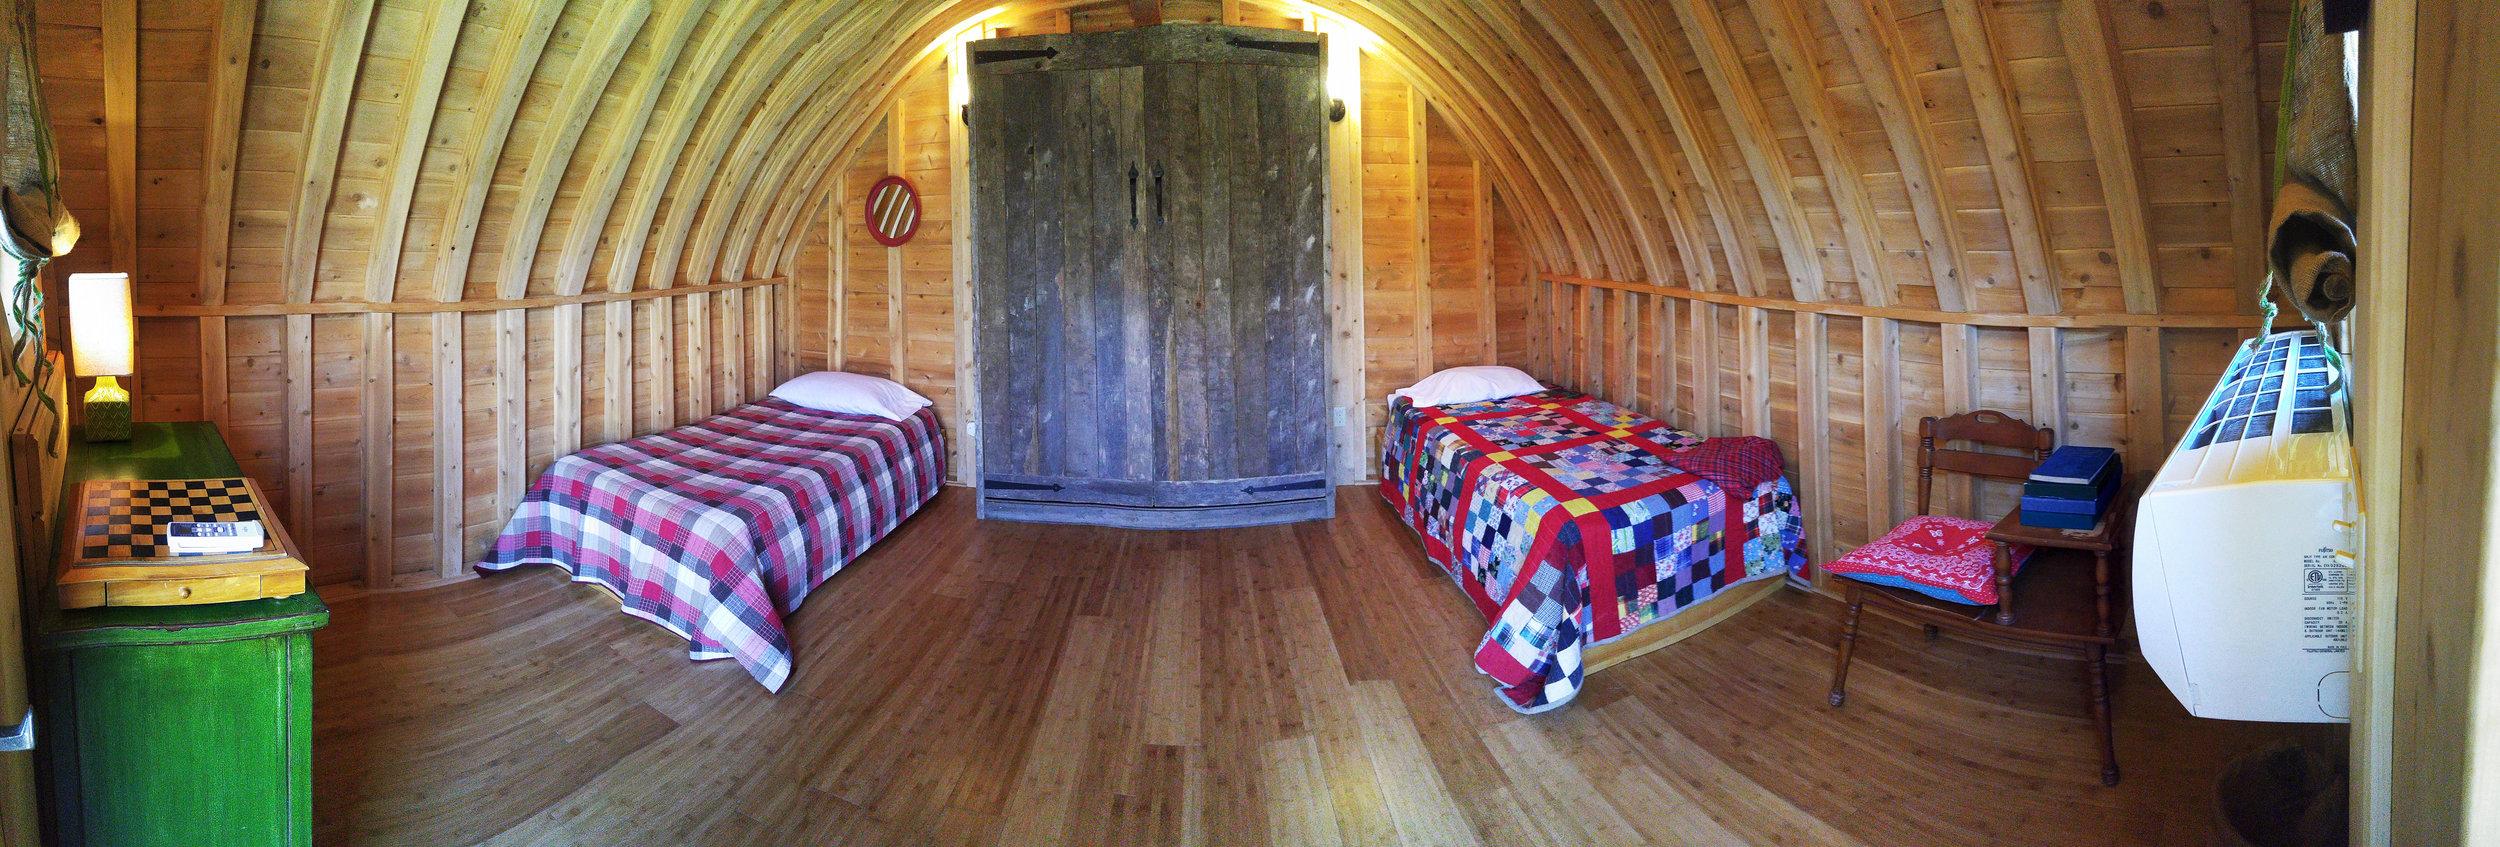 Red hut inside.jpg